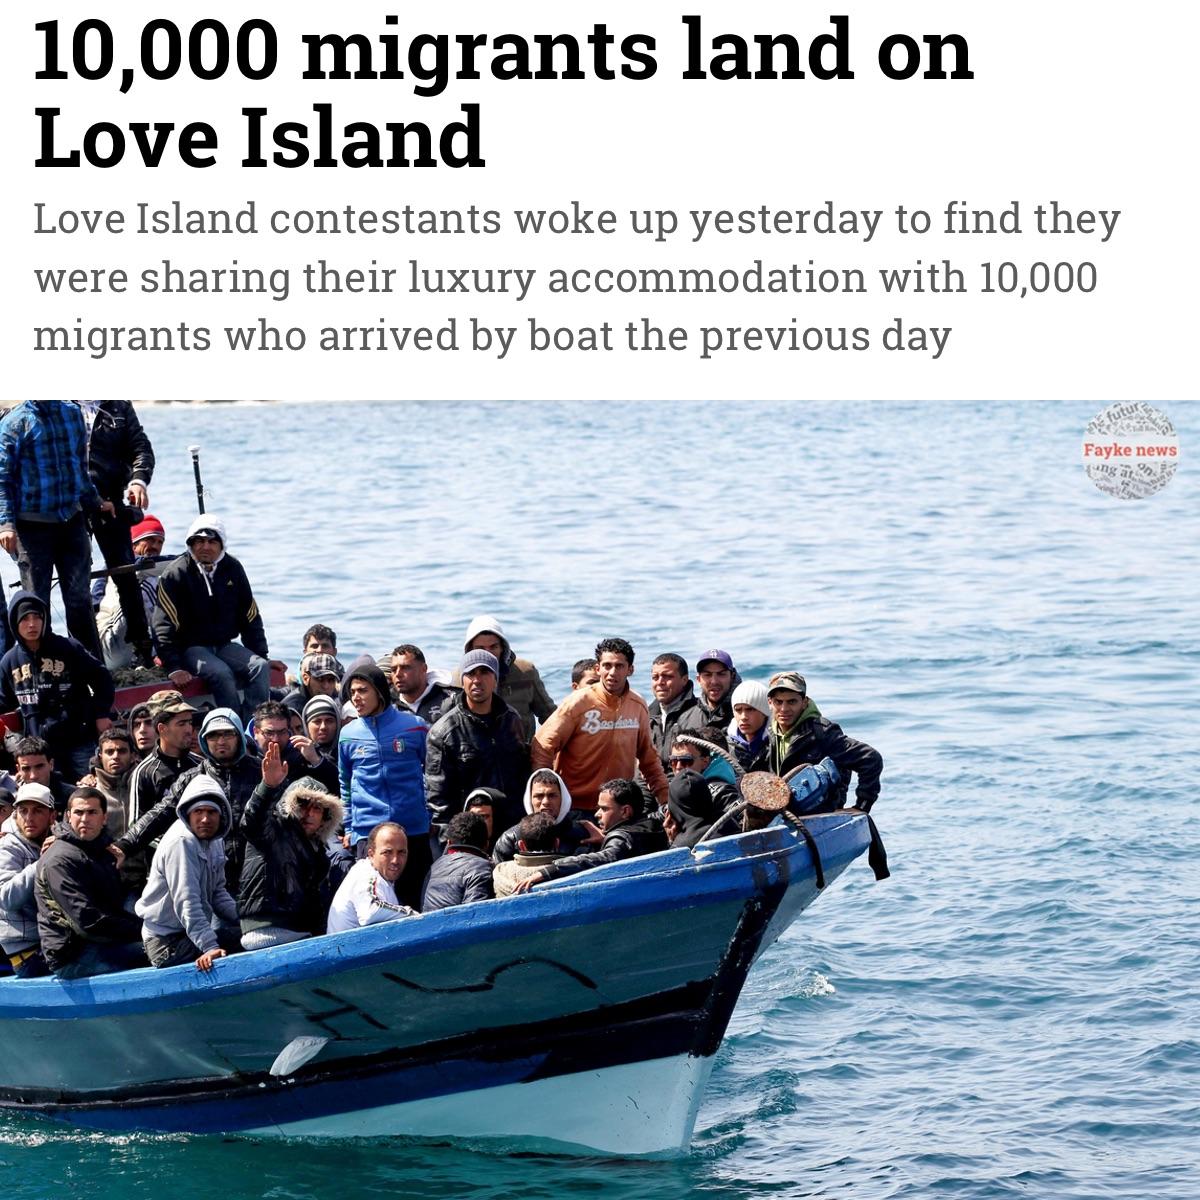 Migrants On Love Island Fake News Satire Meme Fayke News